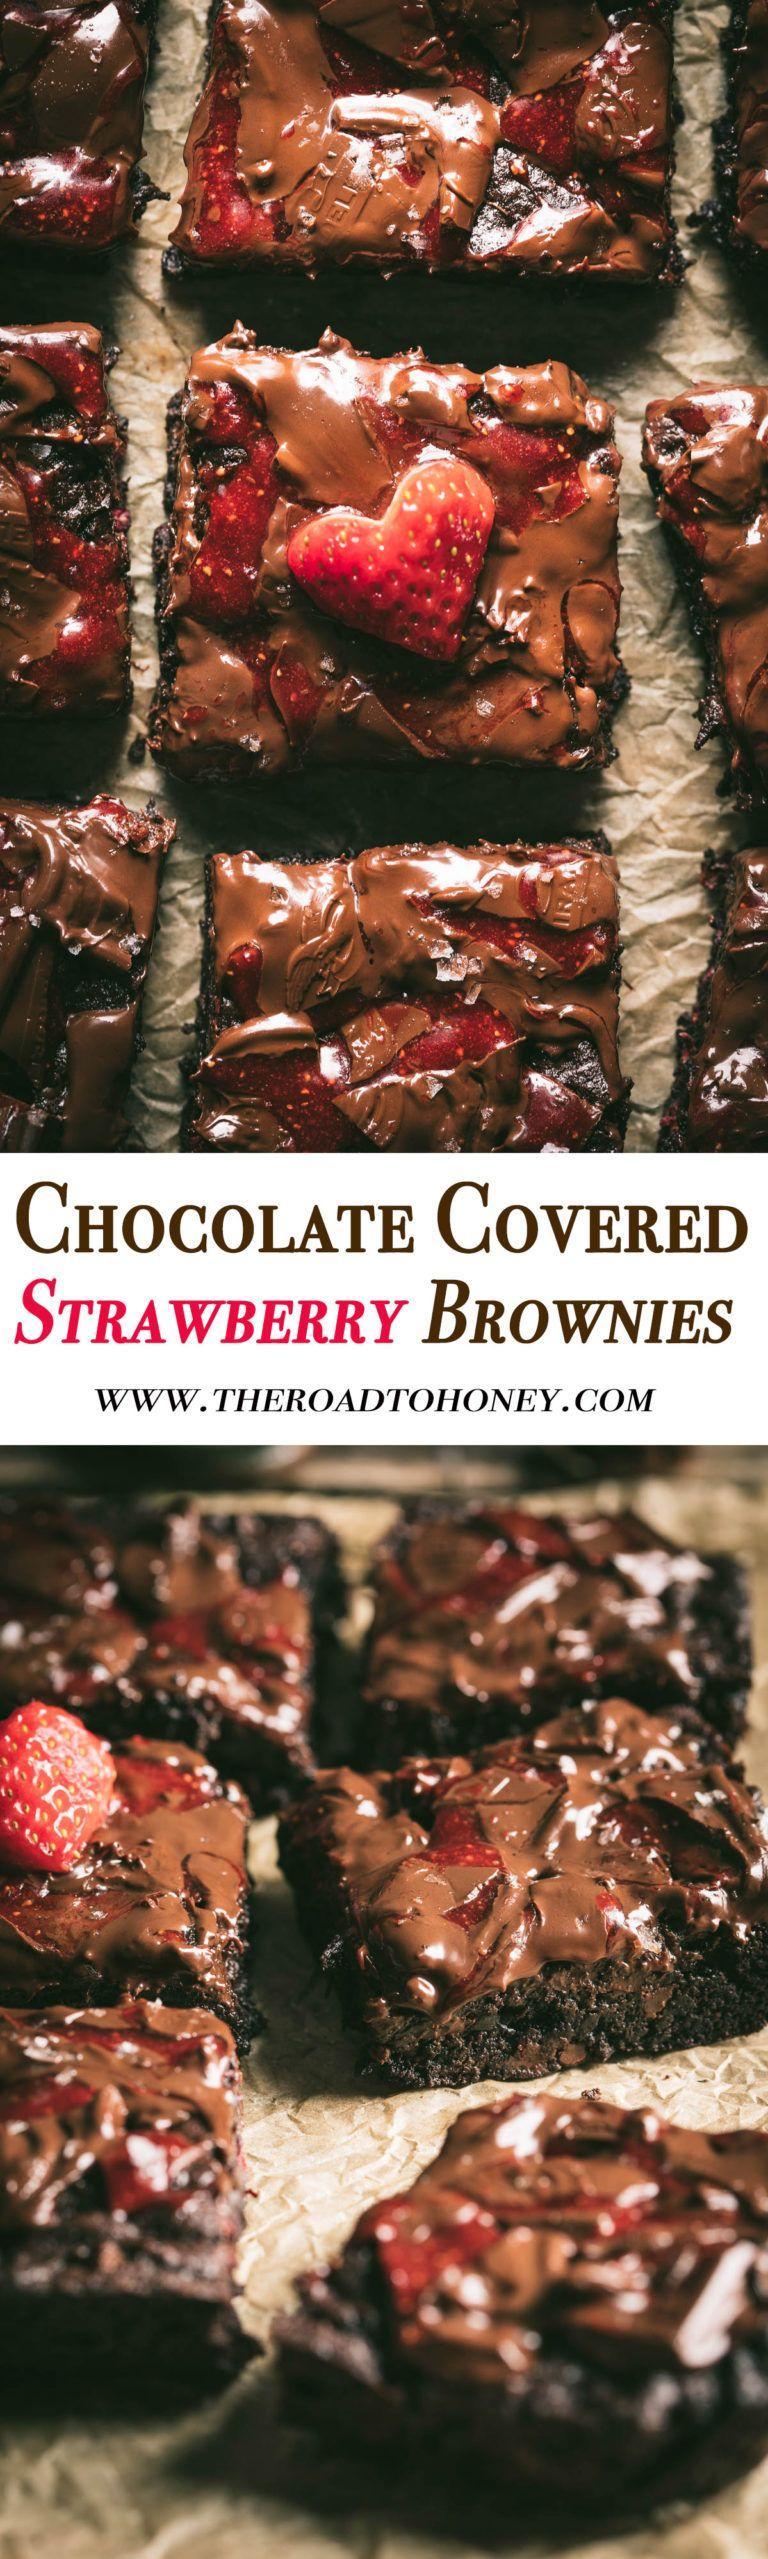 Chocolate Covered Strawberry Brownies #freezedriedraspberries